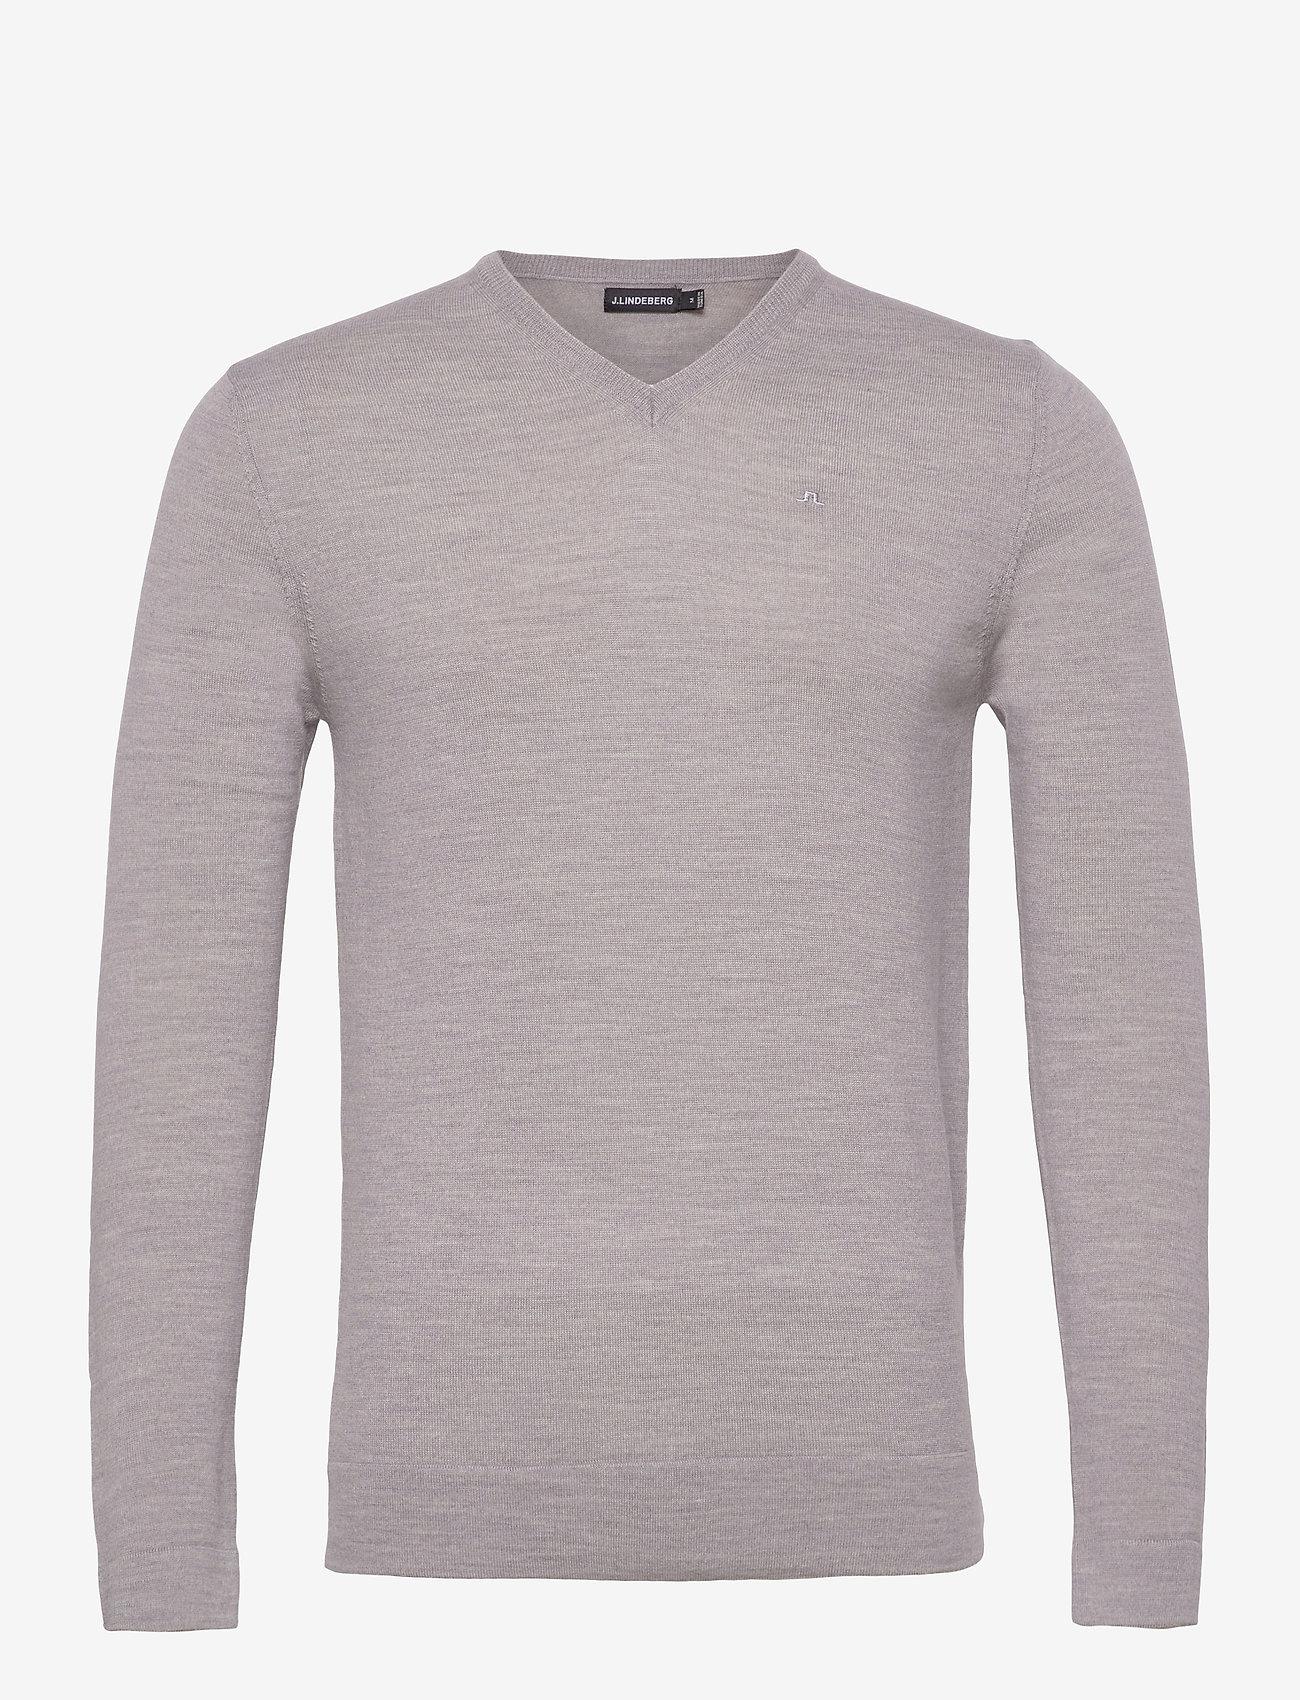 J. Lindeberg - Newman Merino V-neck - basic-strickmode - stone grey melange - 1